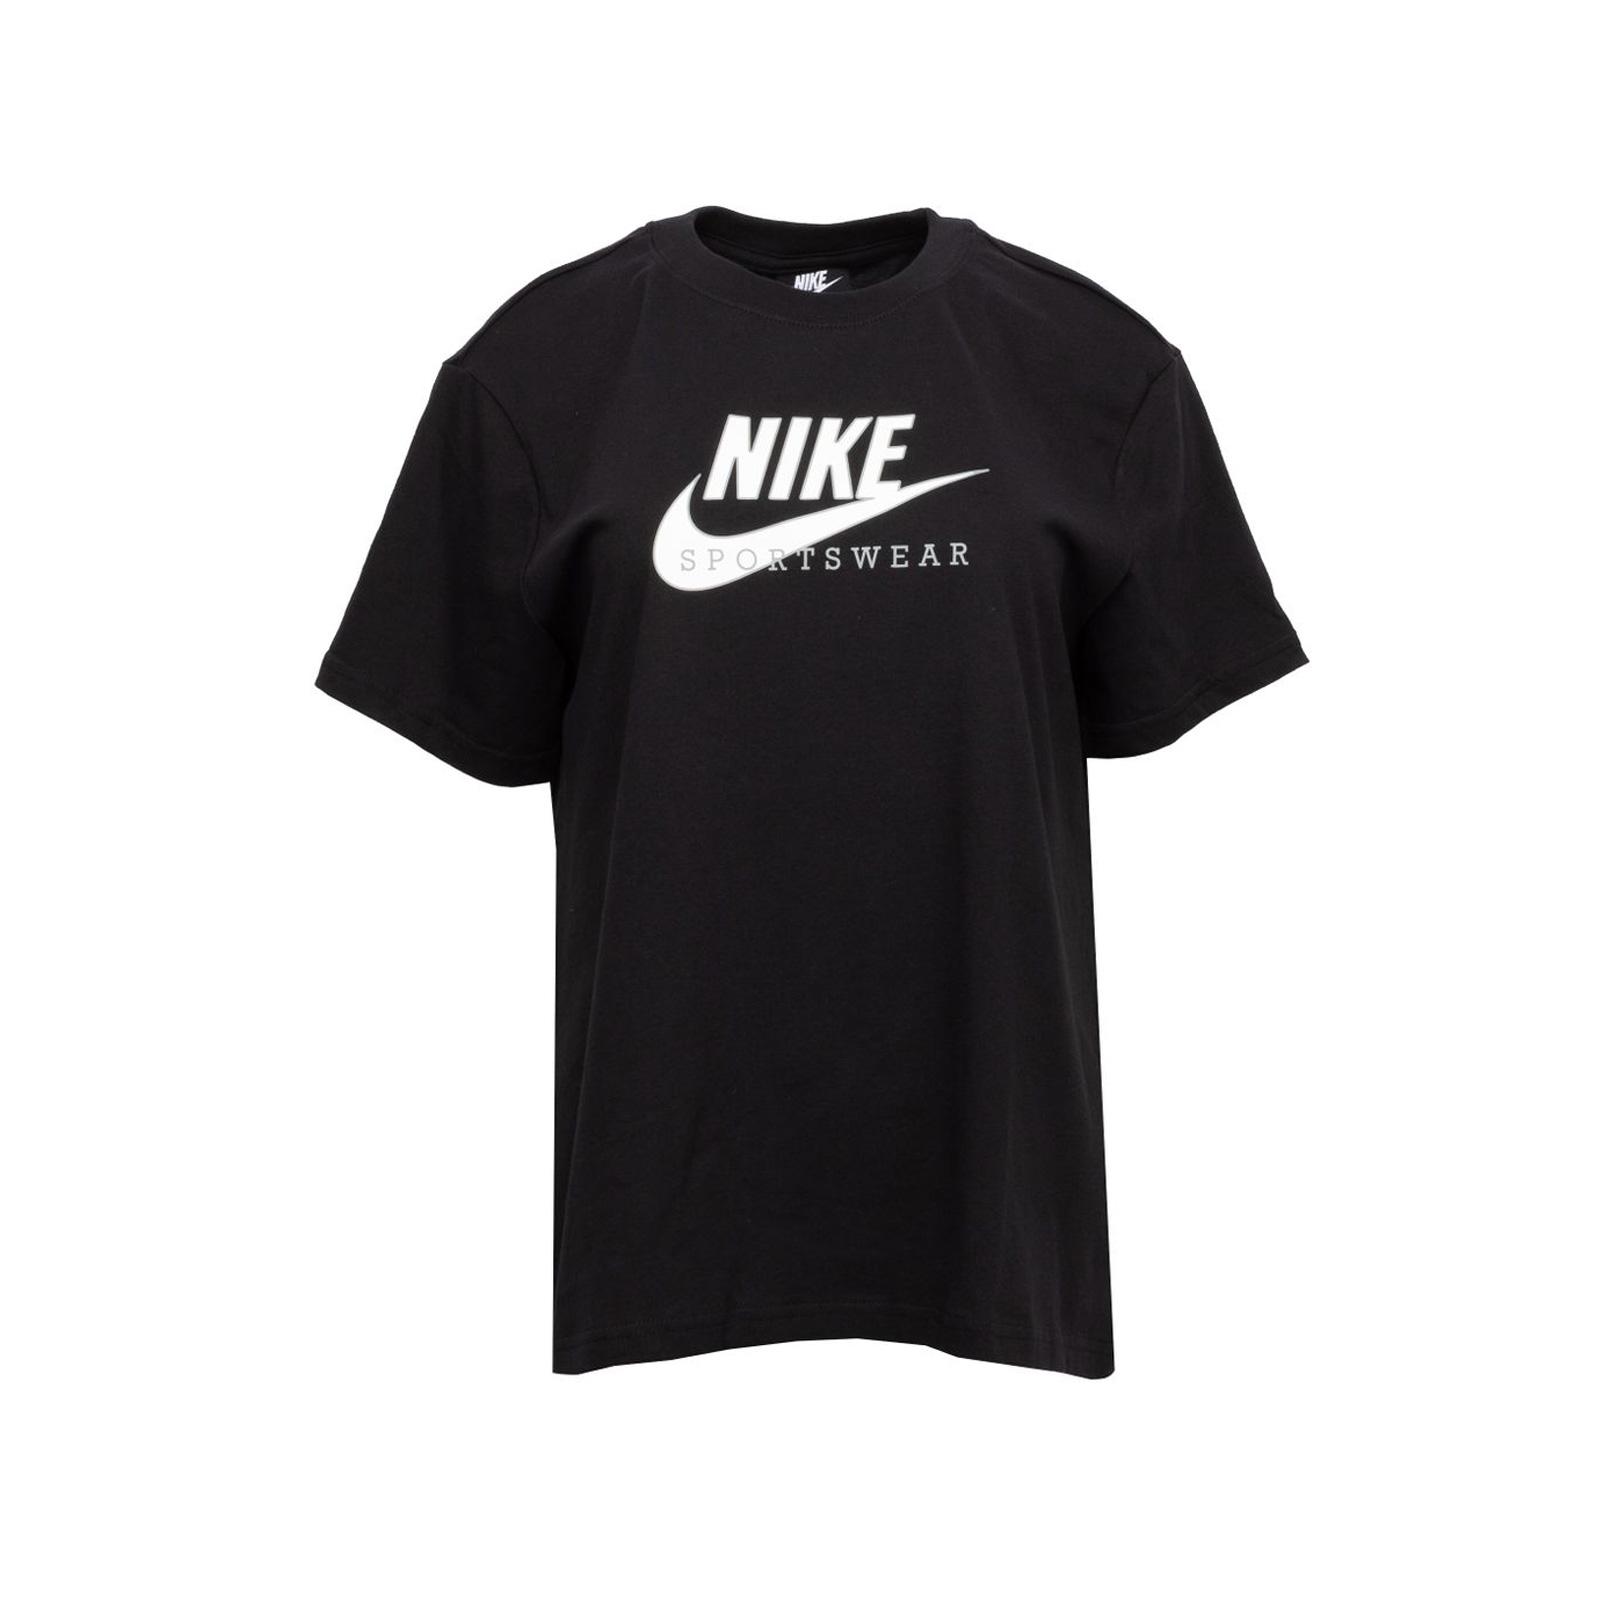 Nike - W NSW HERITAGE SS TOP HBR - BLACK/WHITE/MIDNIGHT NAVY/WHITE - Nike -